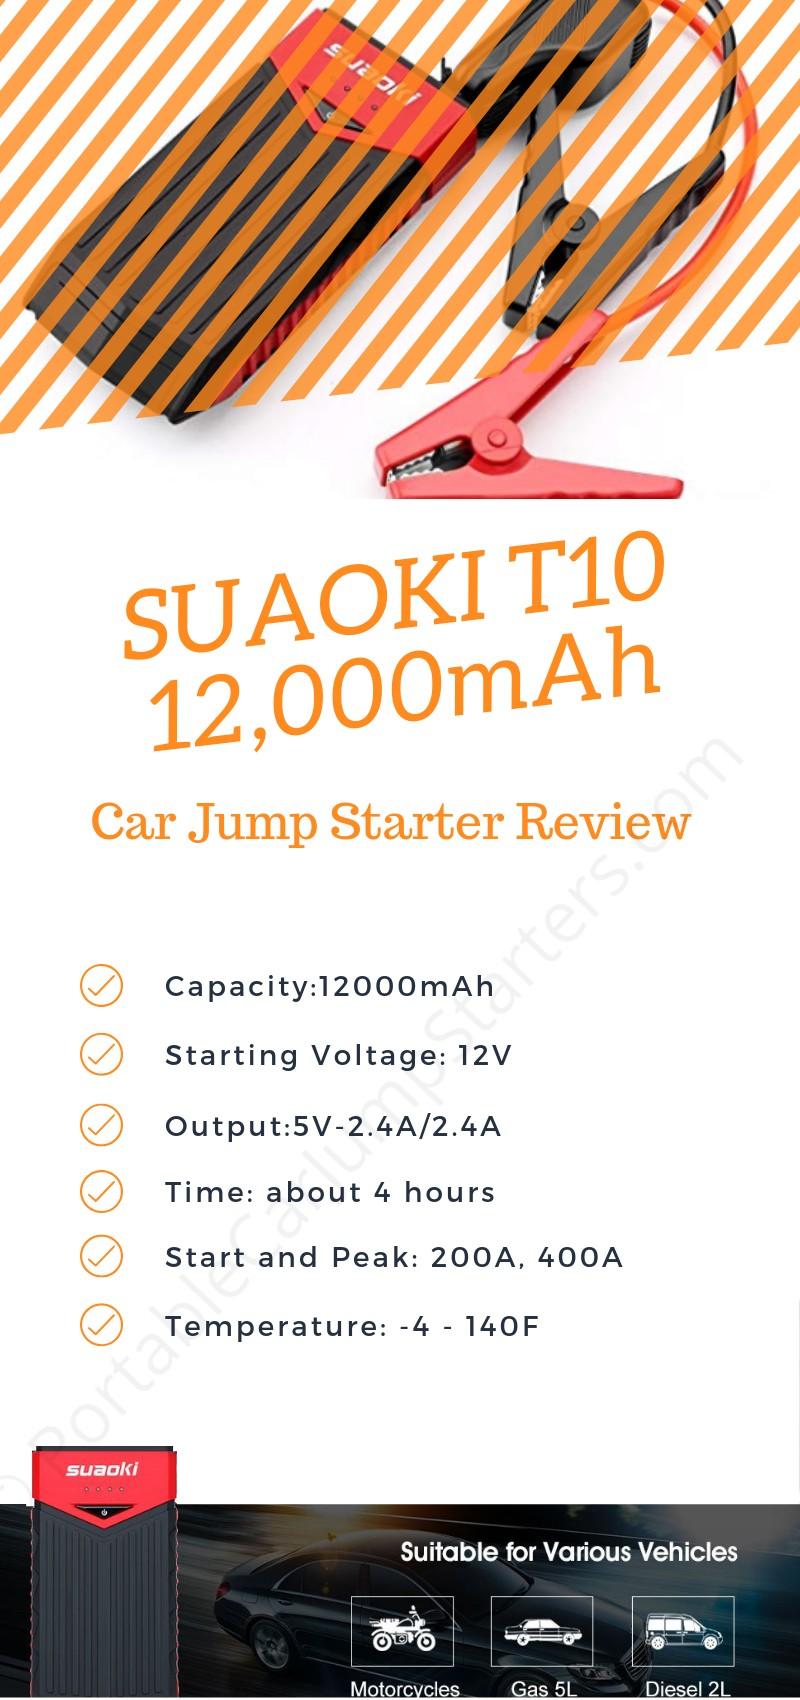 SUAOKI T10 400A 12,000mAh Car Jump Starter Reviews 2019